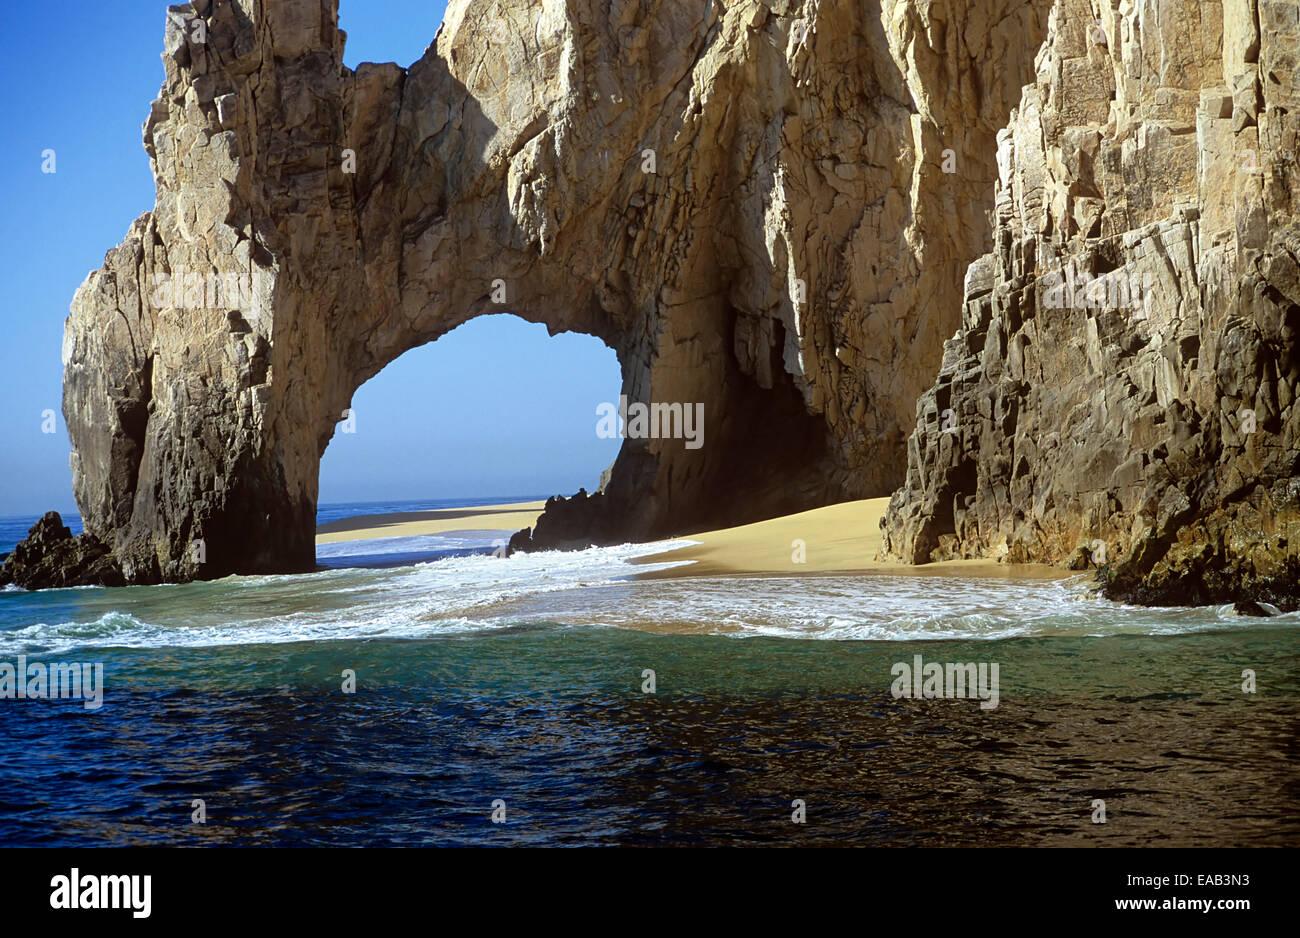 El Arco ( The Arch ) at Land's End is Cabo San Lucas' most recognizable symbol, Baja Sur, Mexico - Stock Image